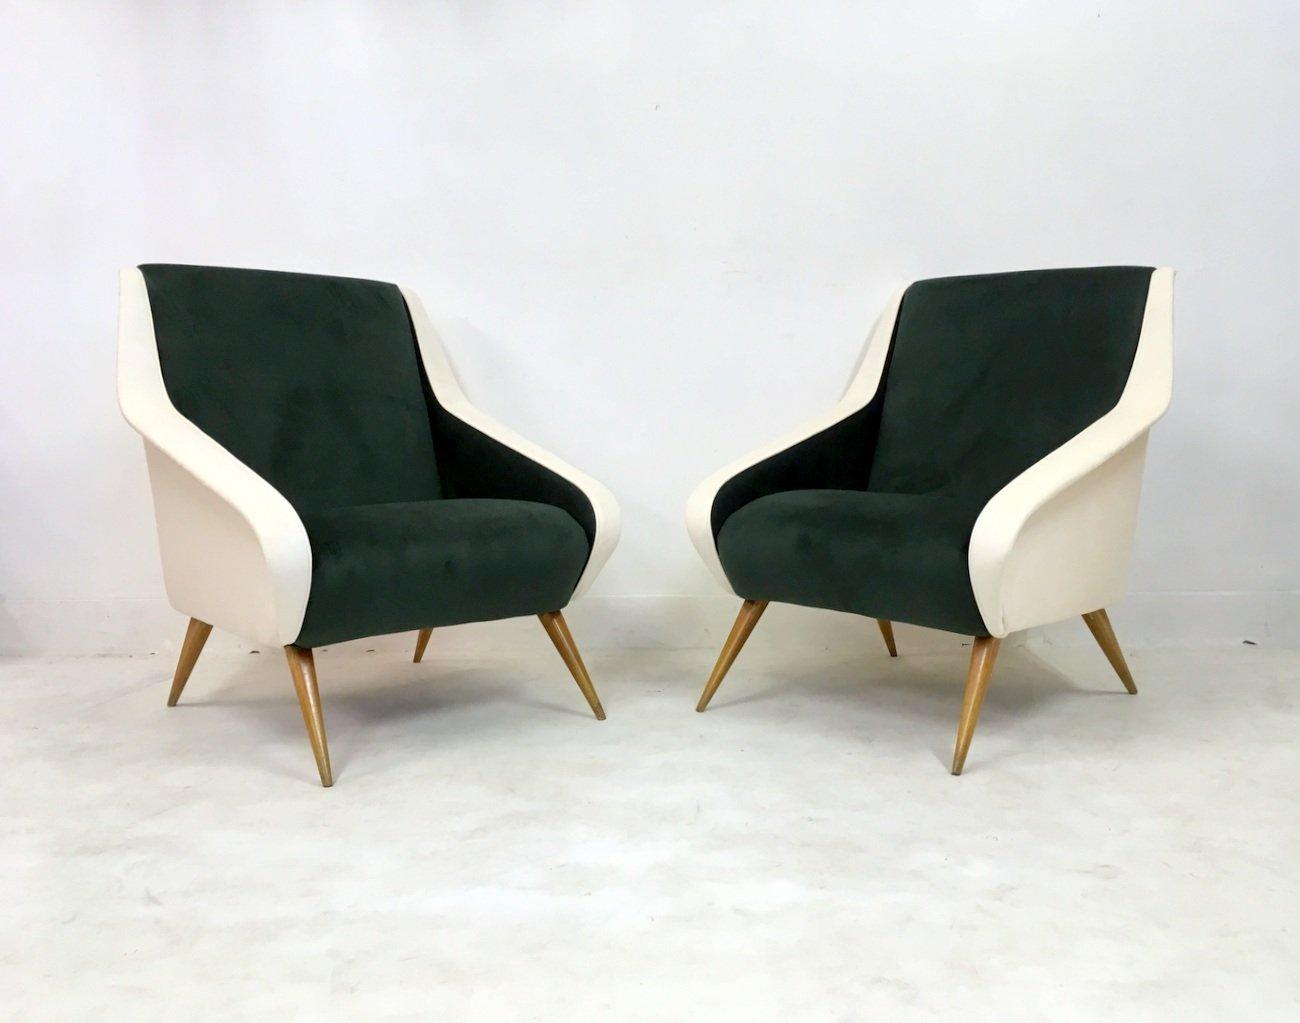 Italienische Samt Sessel In Grun Weiss 1950er 2er Set Bei Pamono